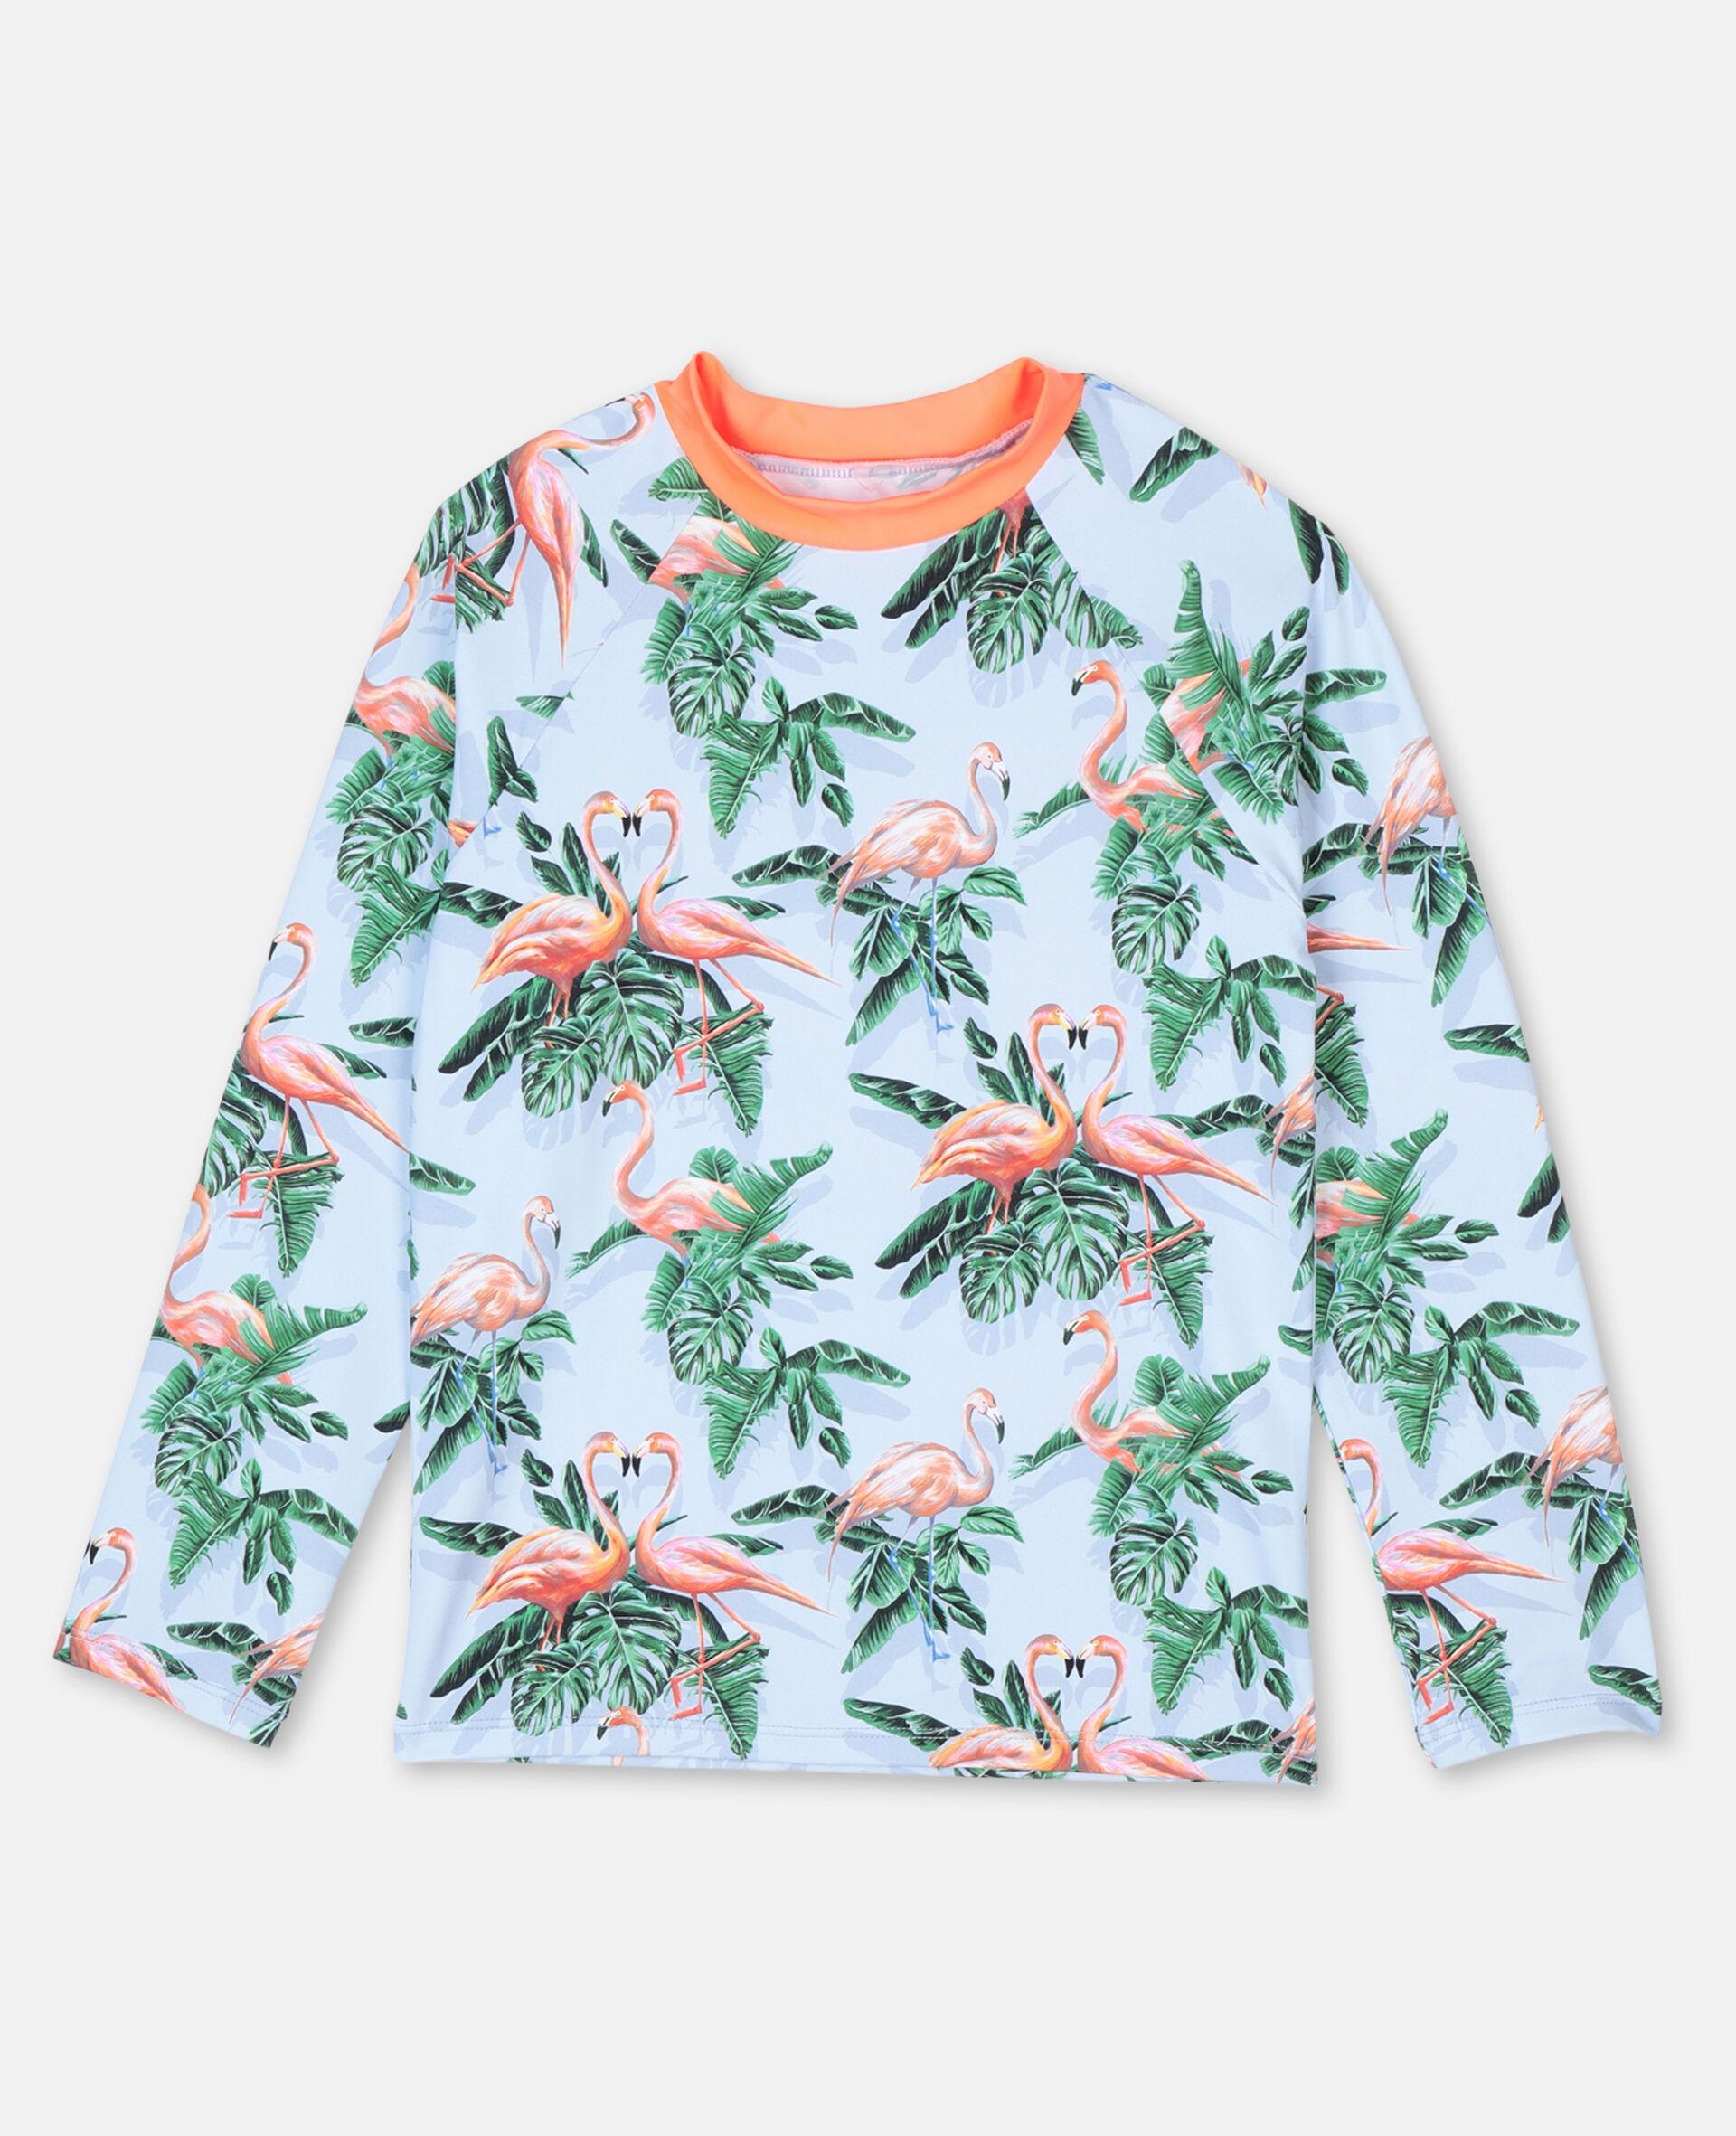 Painty Flamingo游泳T恤 -绿色-large image number 0